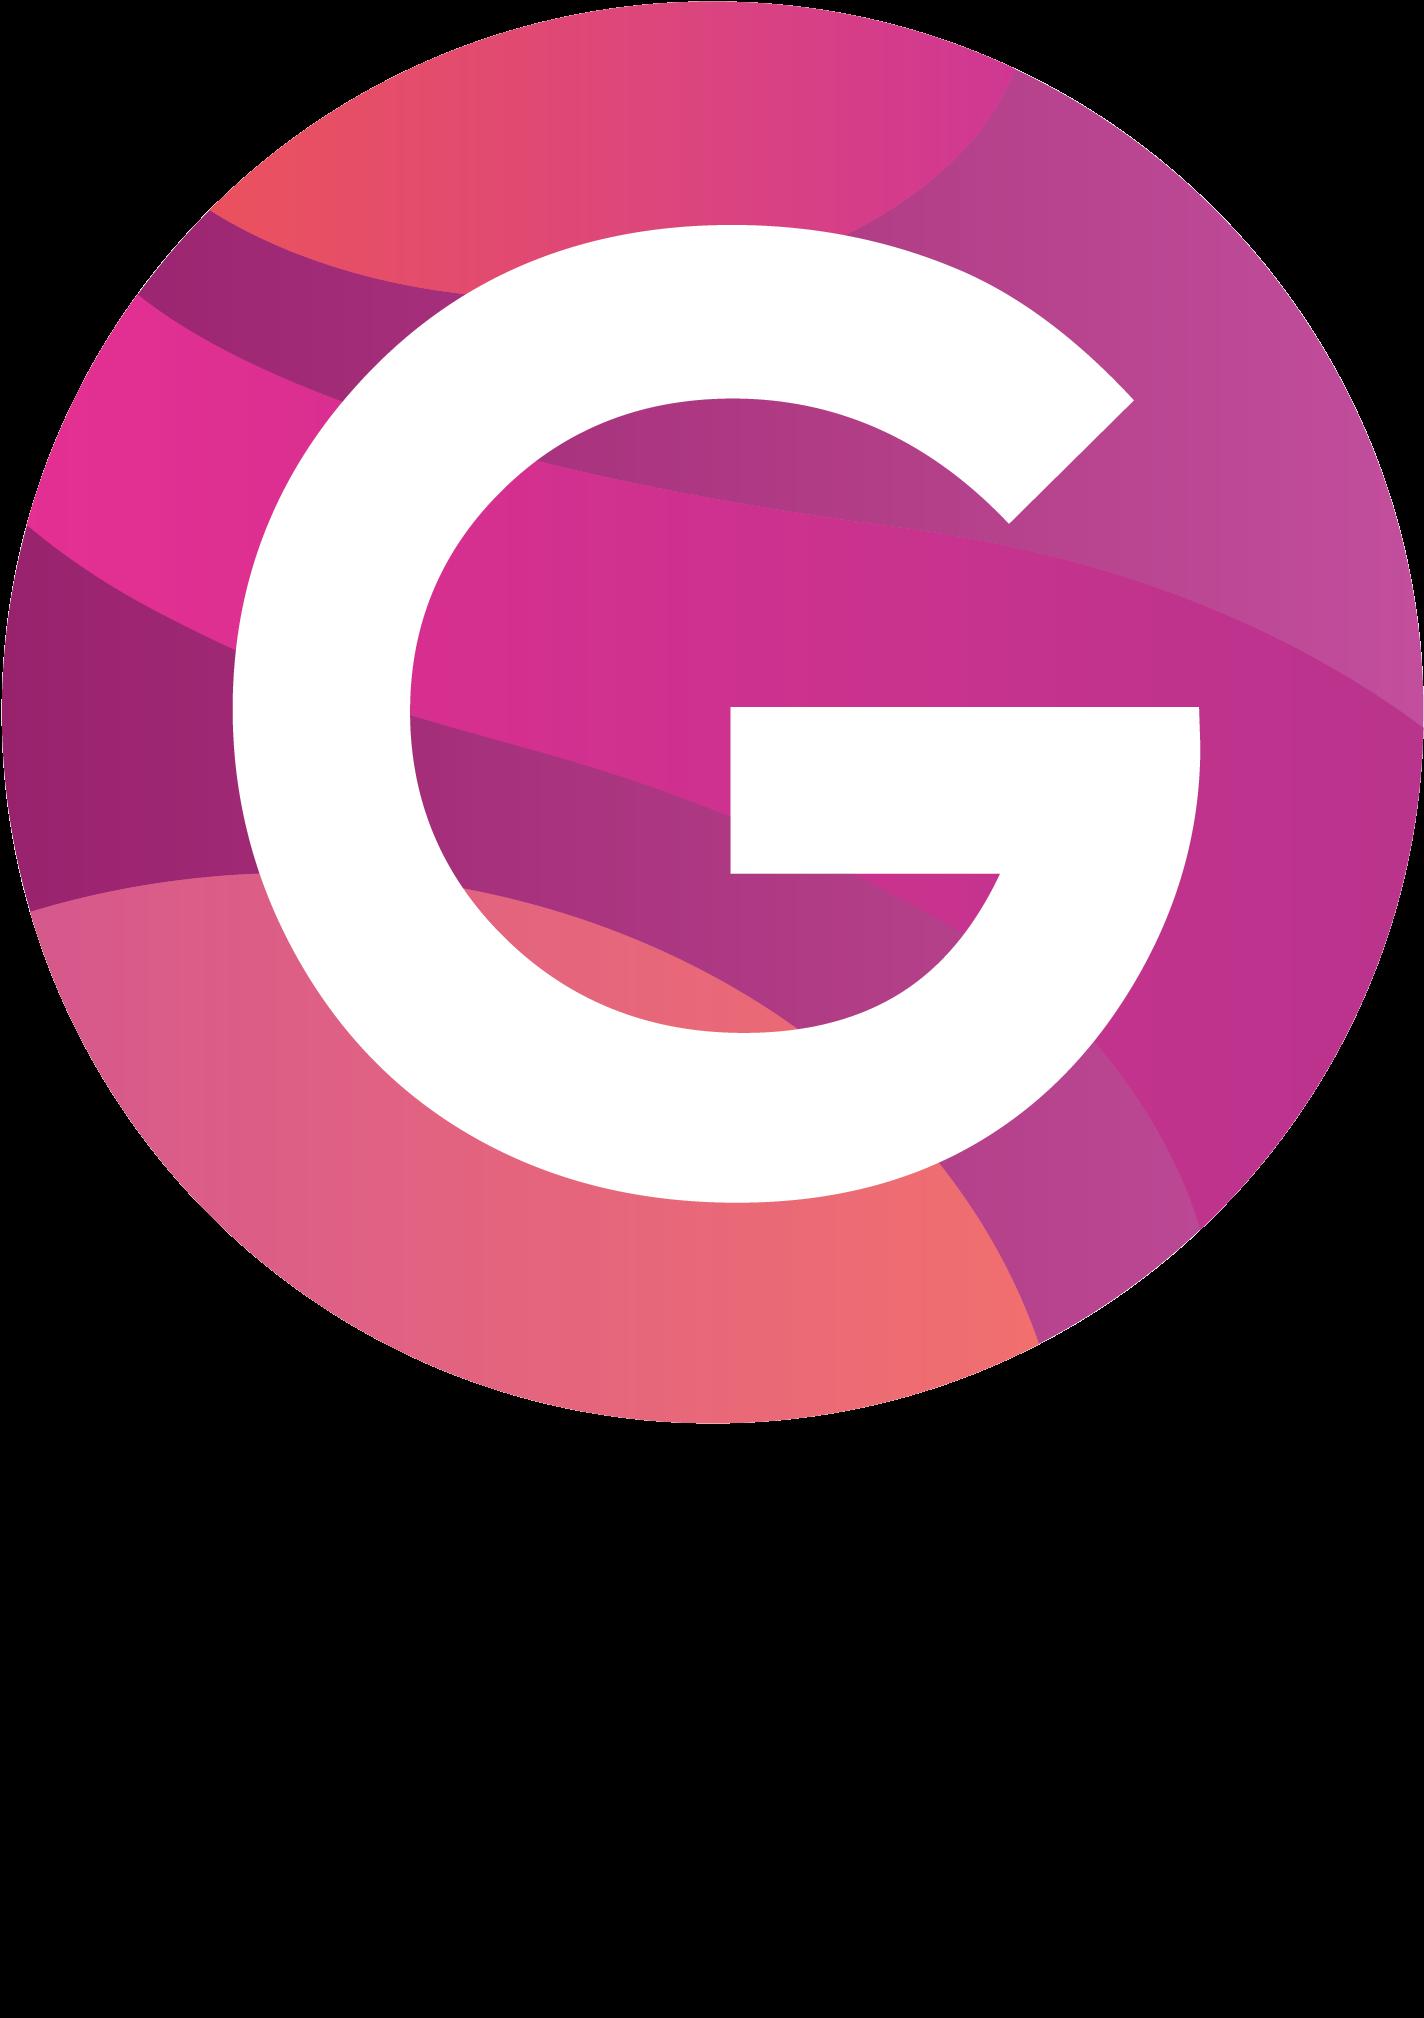 It Works Independent Distributor Logo Png (+).